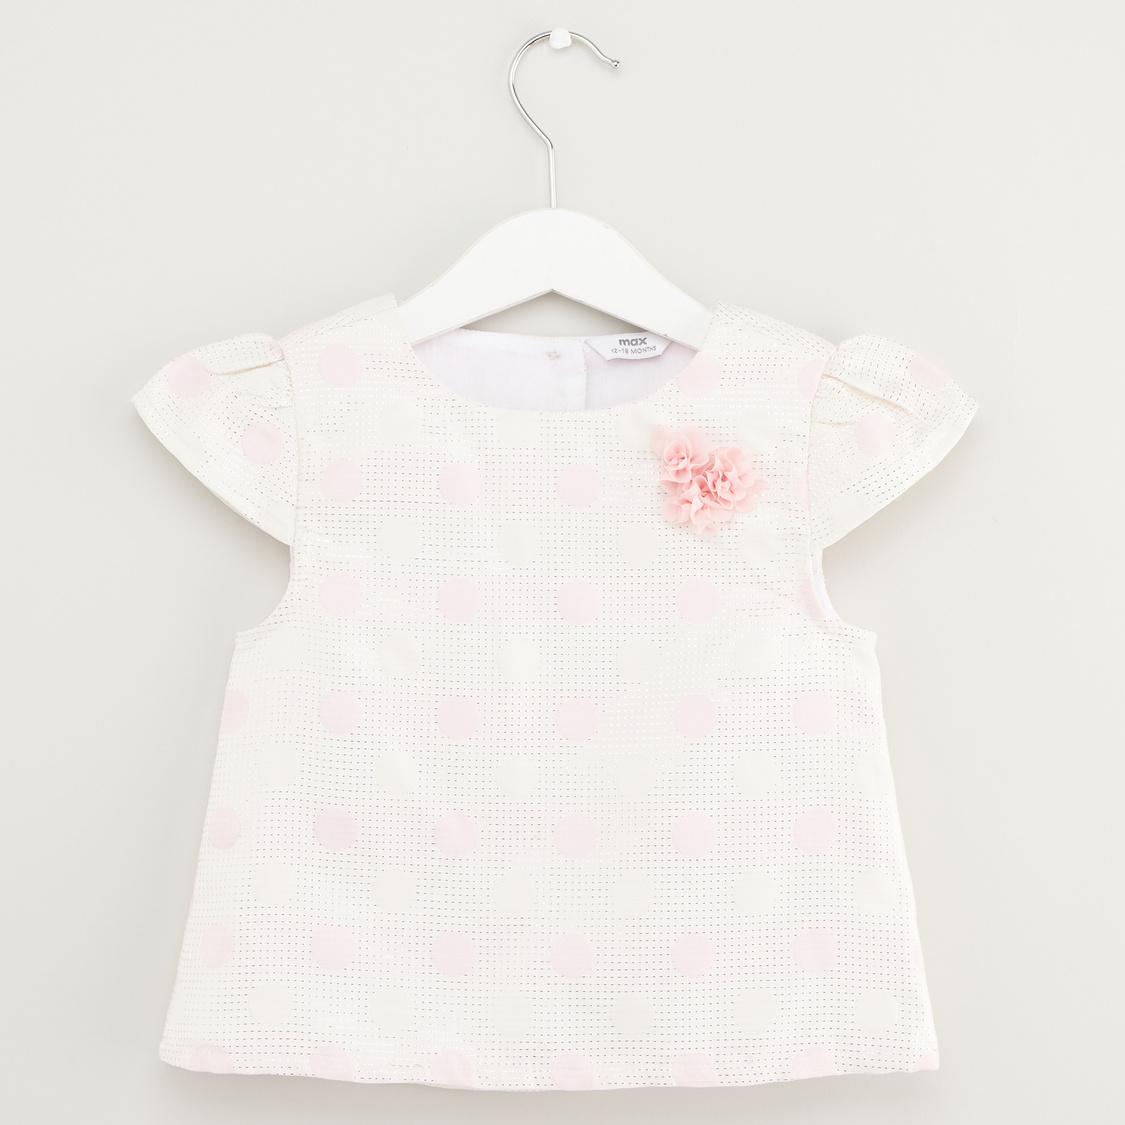 Textured Polka Dots Print Top and Skirt Set